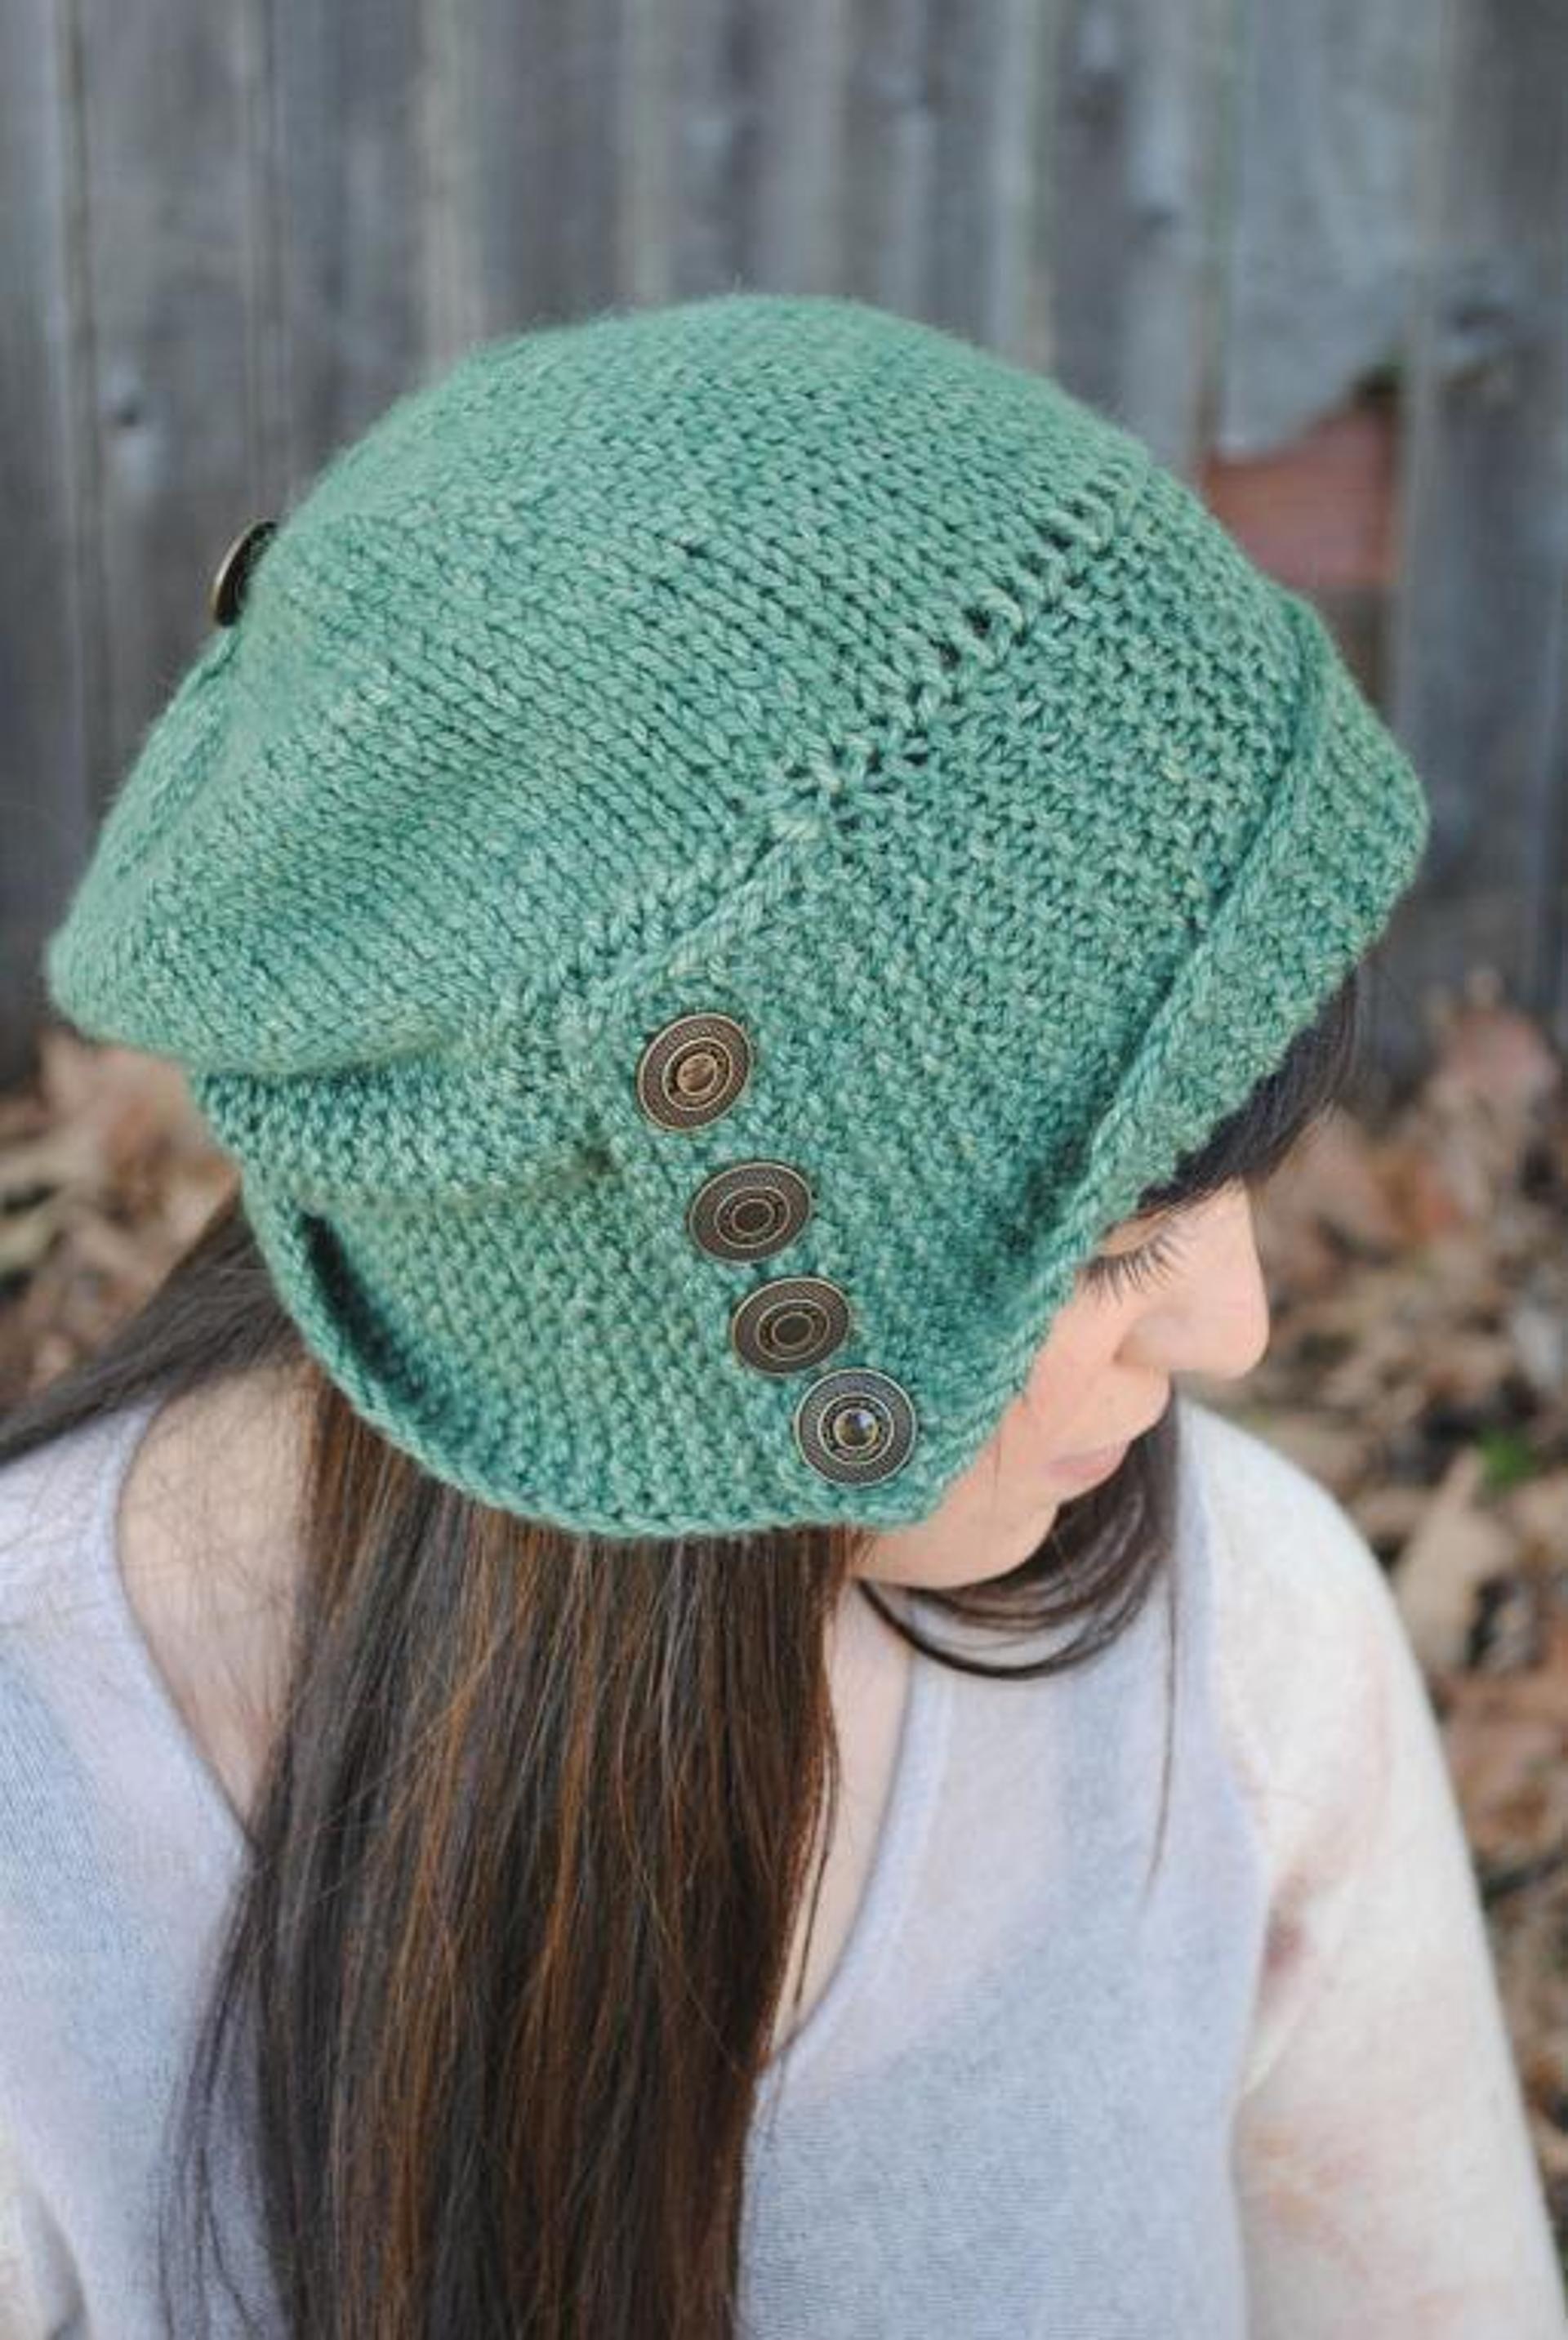 Robin Hood | Robin hoods, Robins and Knitting patterns